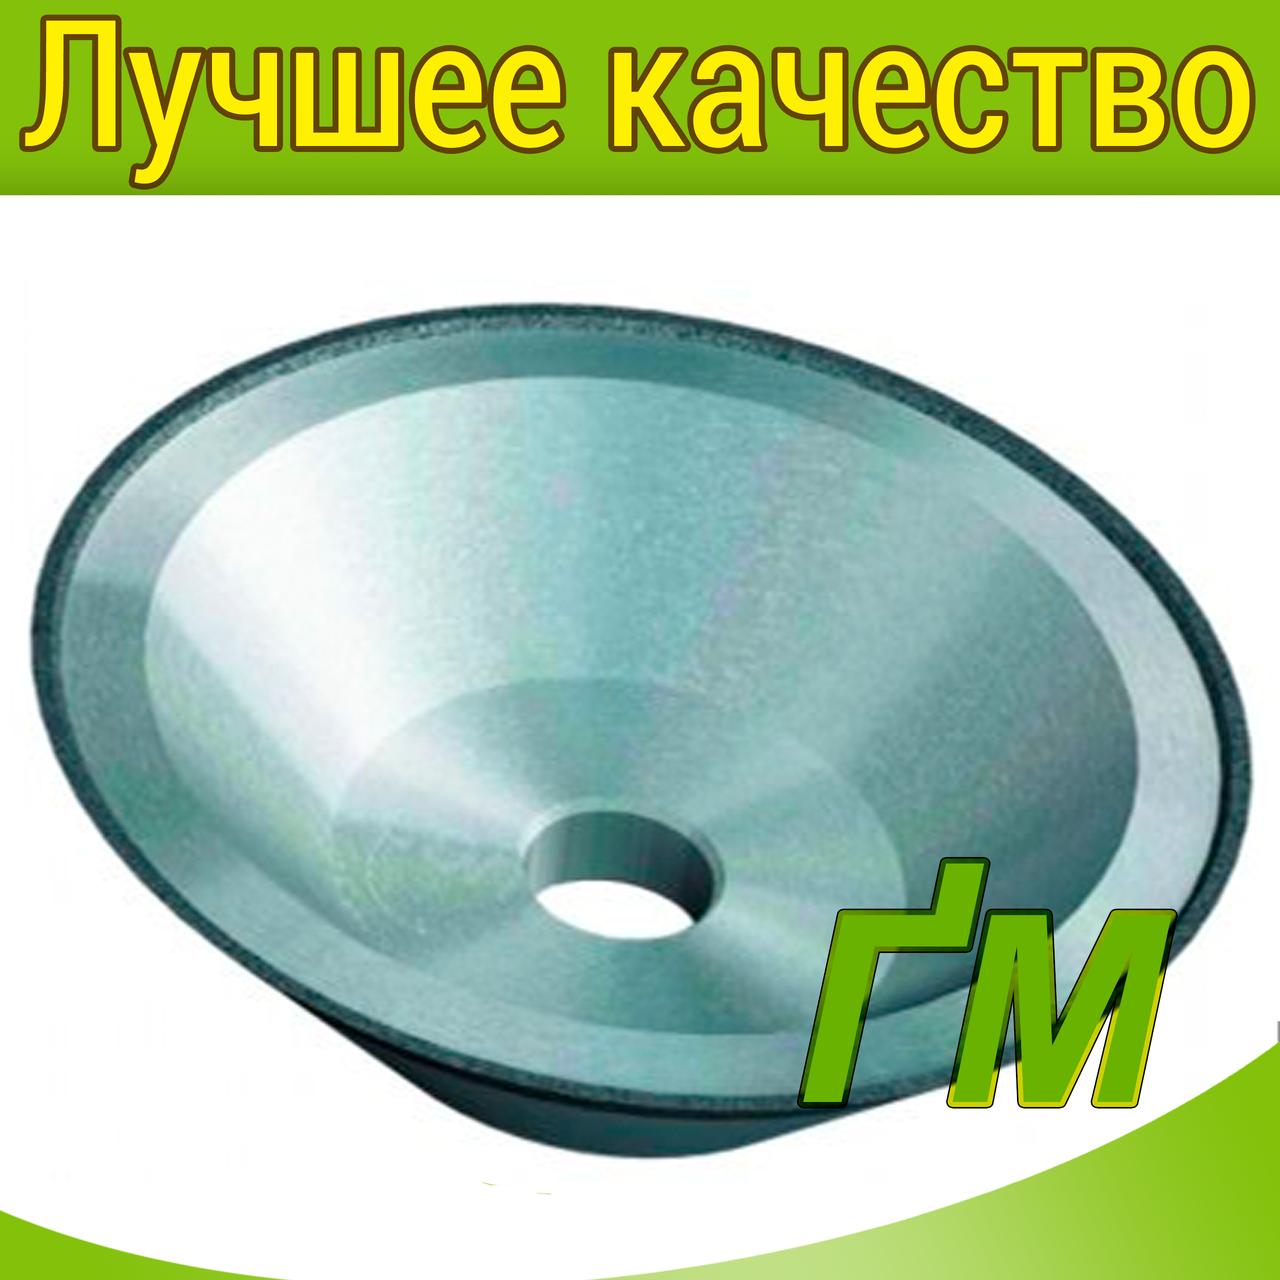 Круг алмазный чашечный конический 12А2-45 Ф 150х40х20х3х32 АС4 160/125 100% В2-01 108 карат